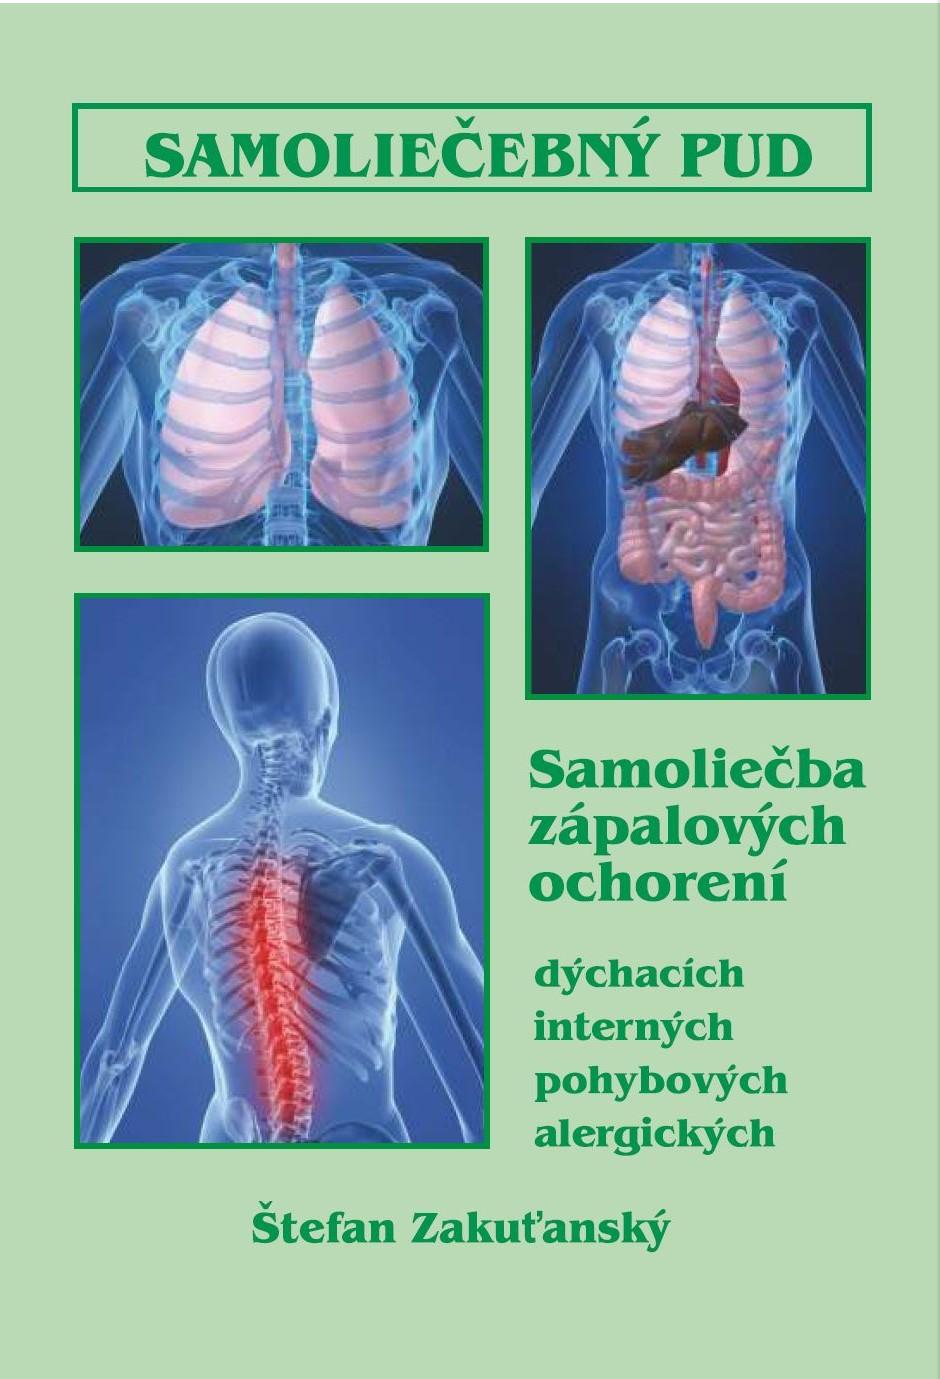 Samoliečebný pud (brož.) - samoliečba zápalových ochorení